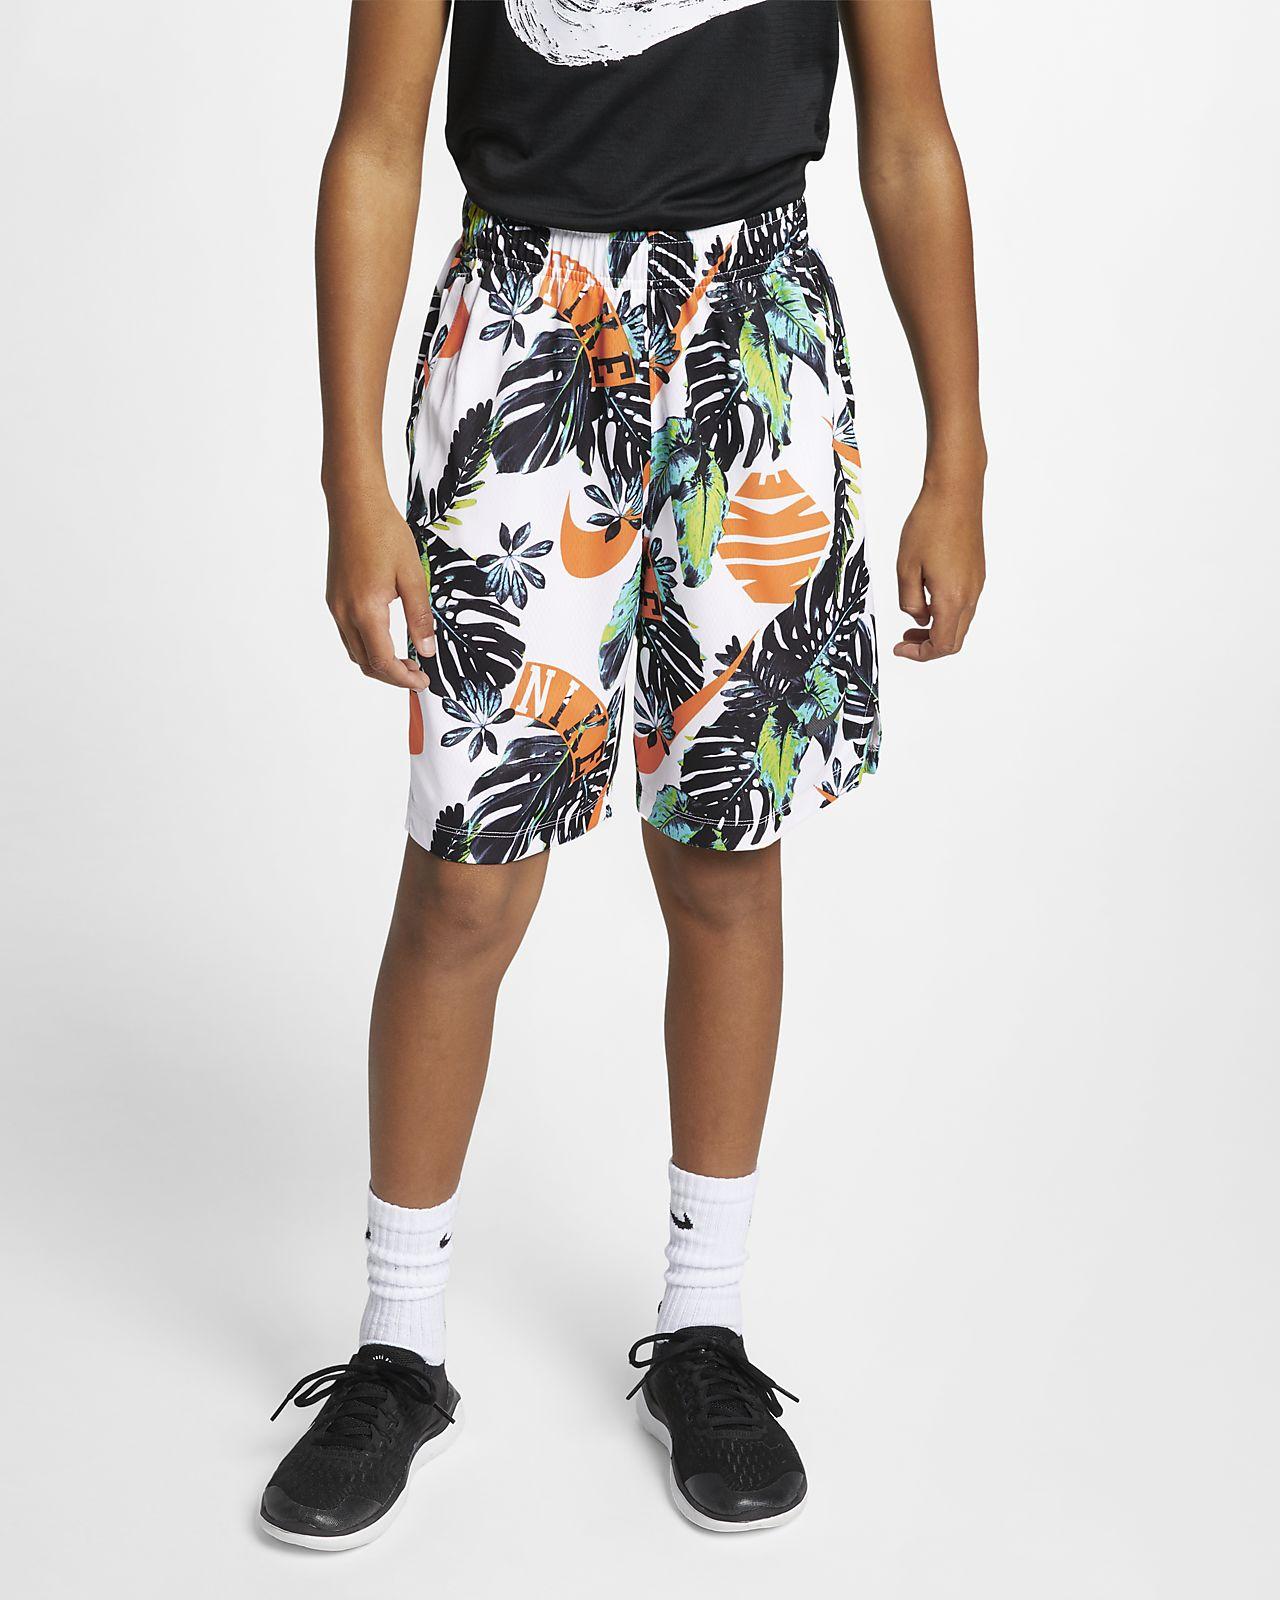 Nike Dri-FIT Trainingsshorts met print voor jongens